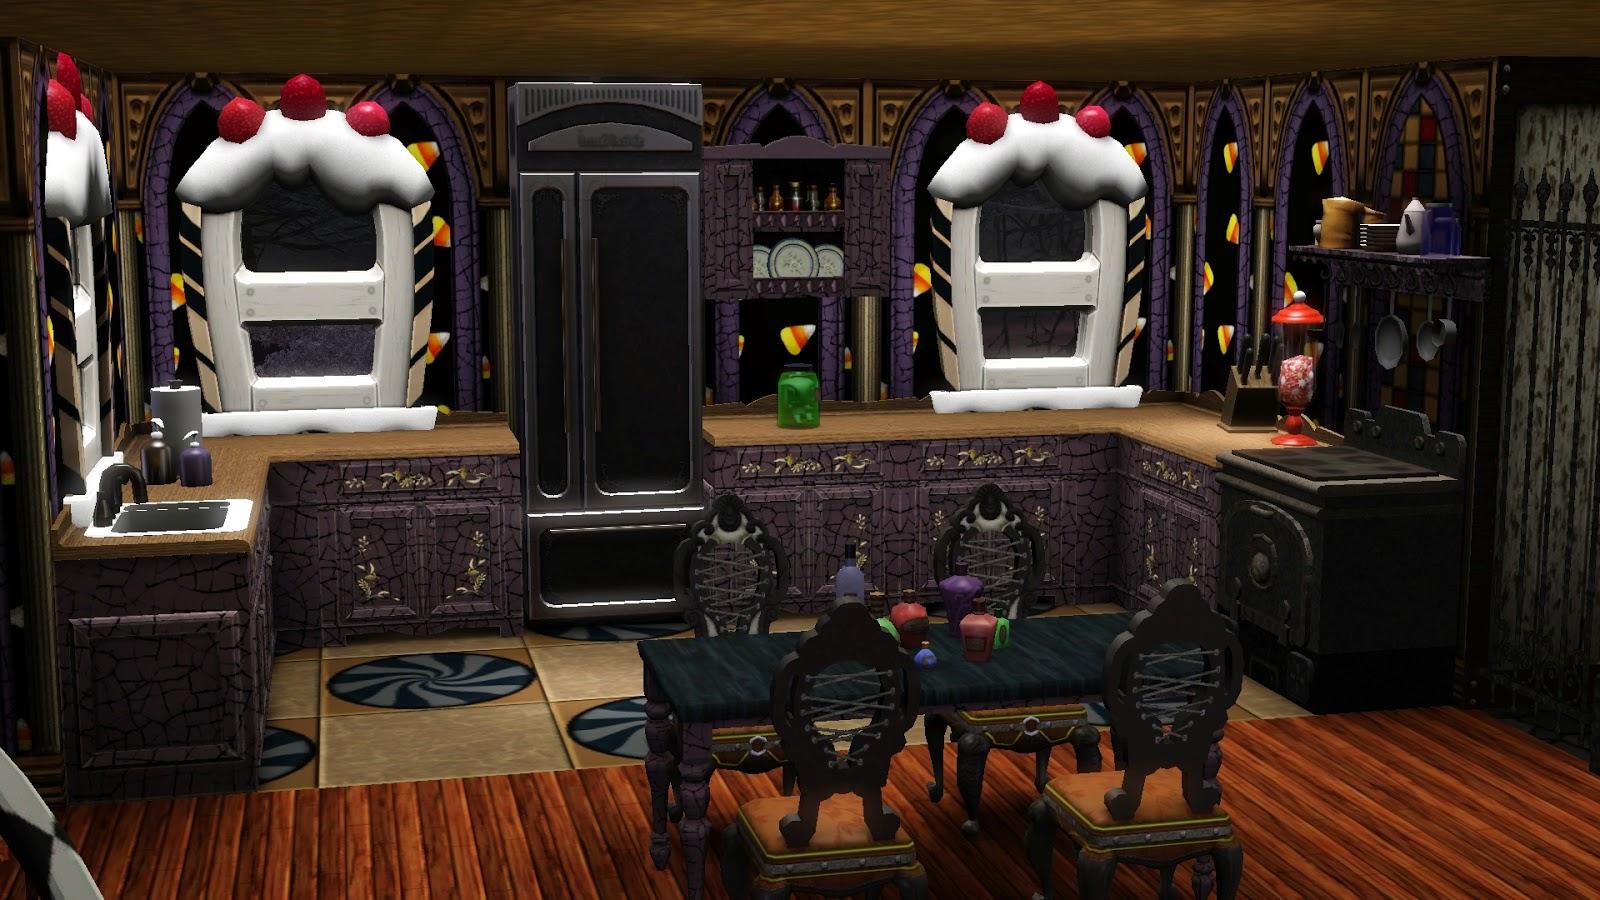 My sims 3 blog hansel and gretel by ruth kay - Hansel home ...